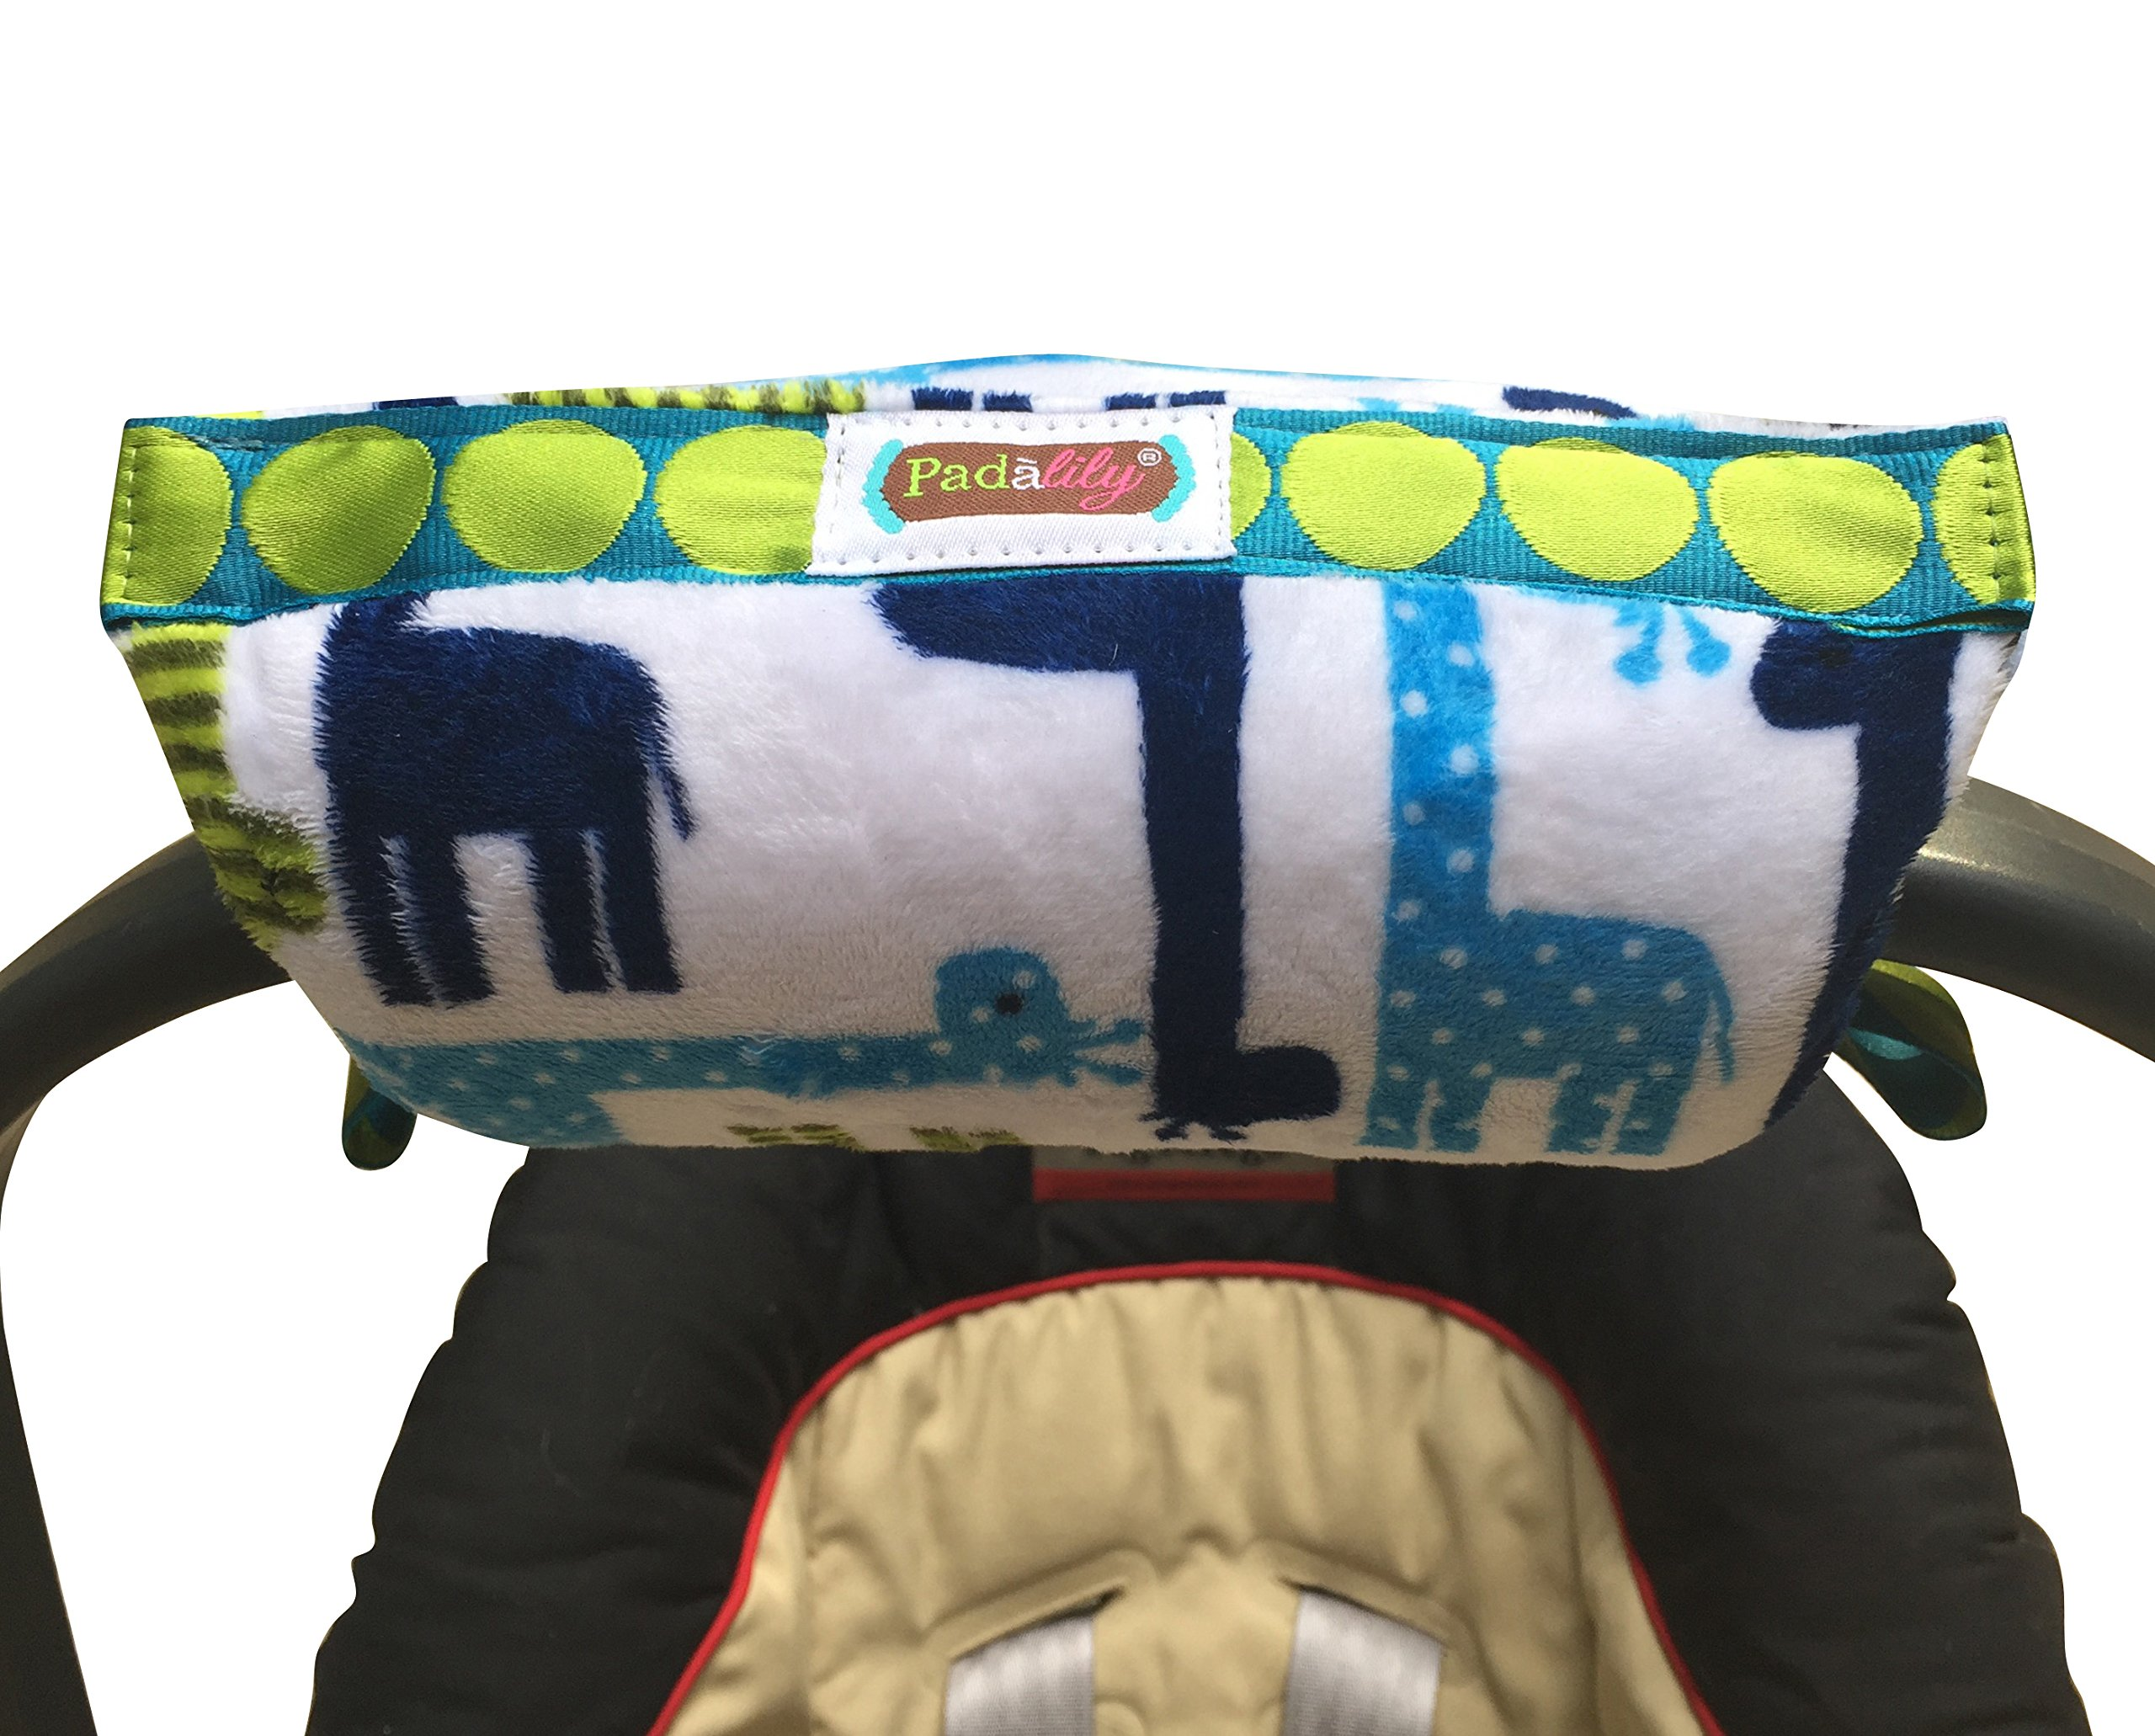 Get Quotations Padalily The Original Car Seat Handle Cushion Pad Pillow Newborn 0 12 Months